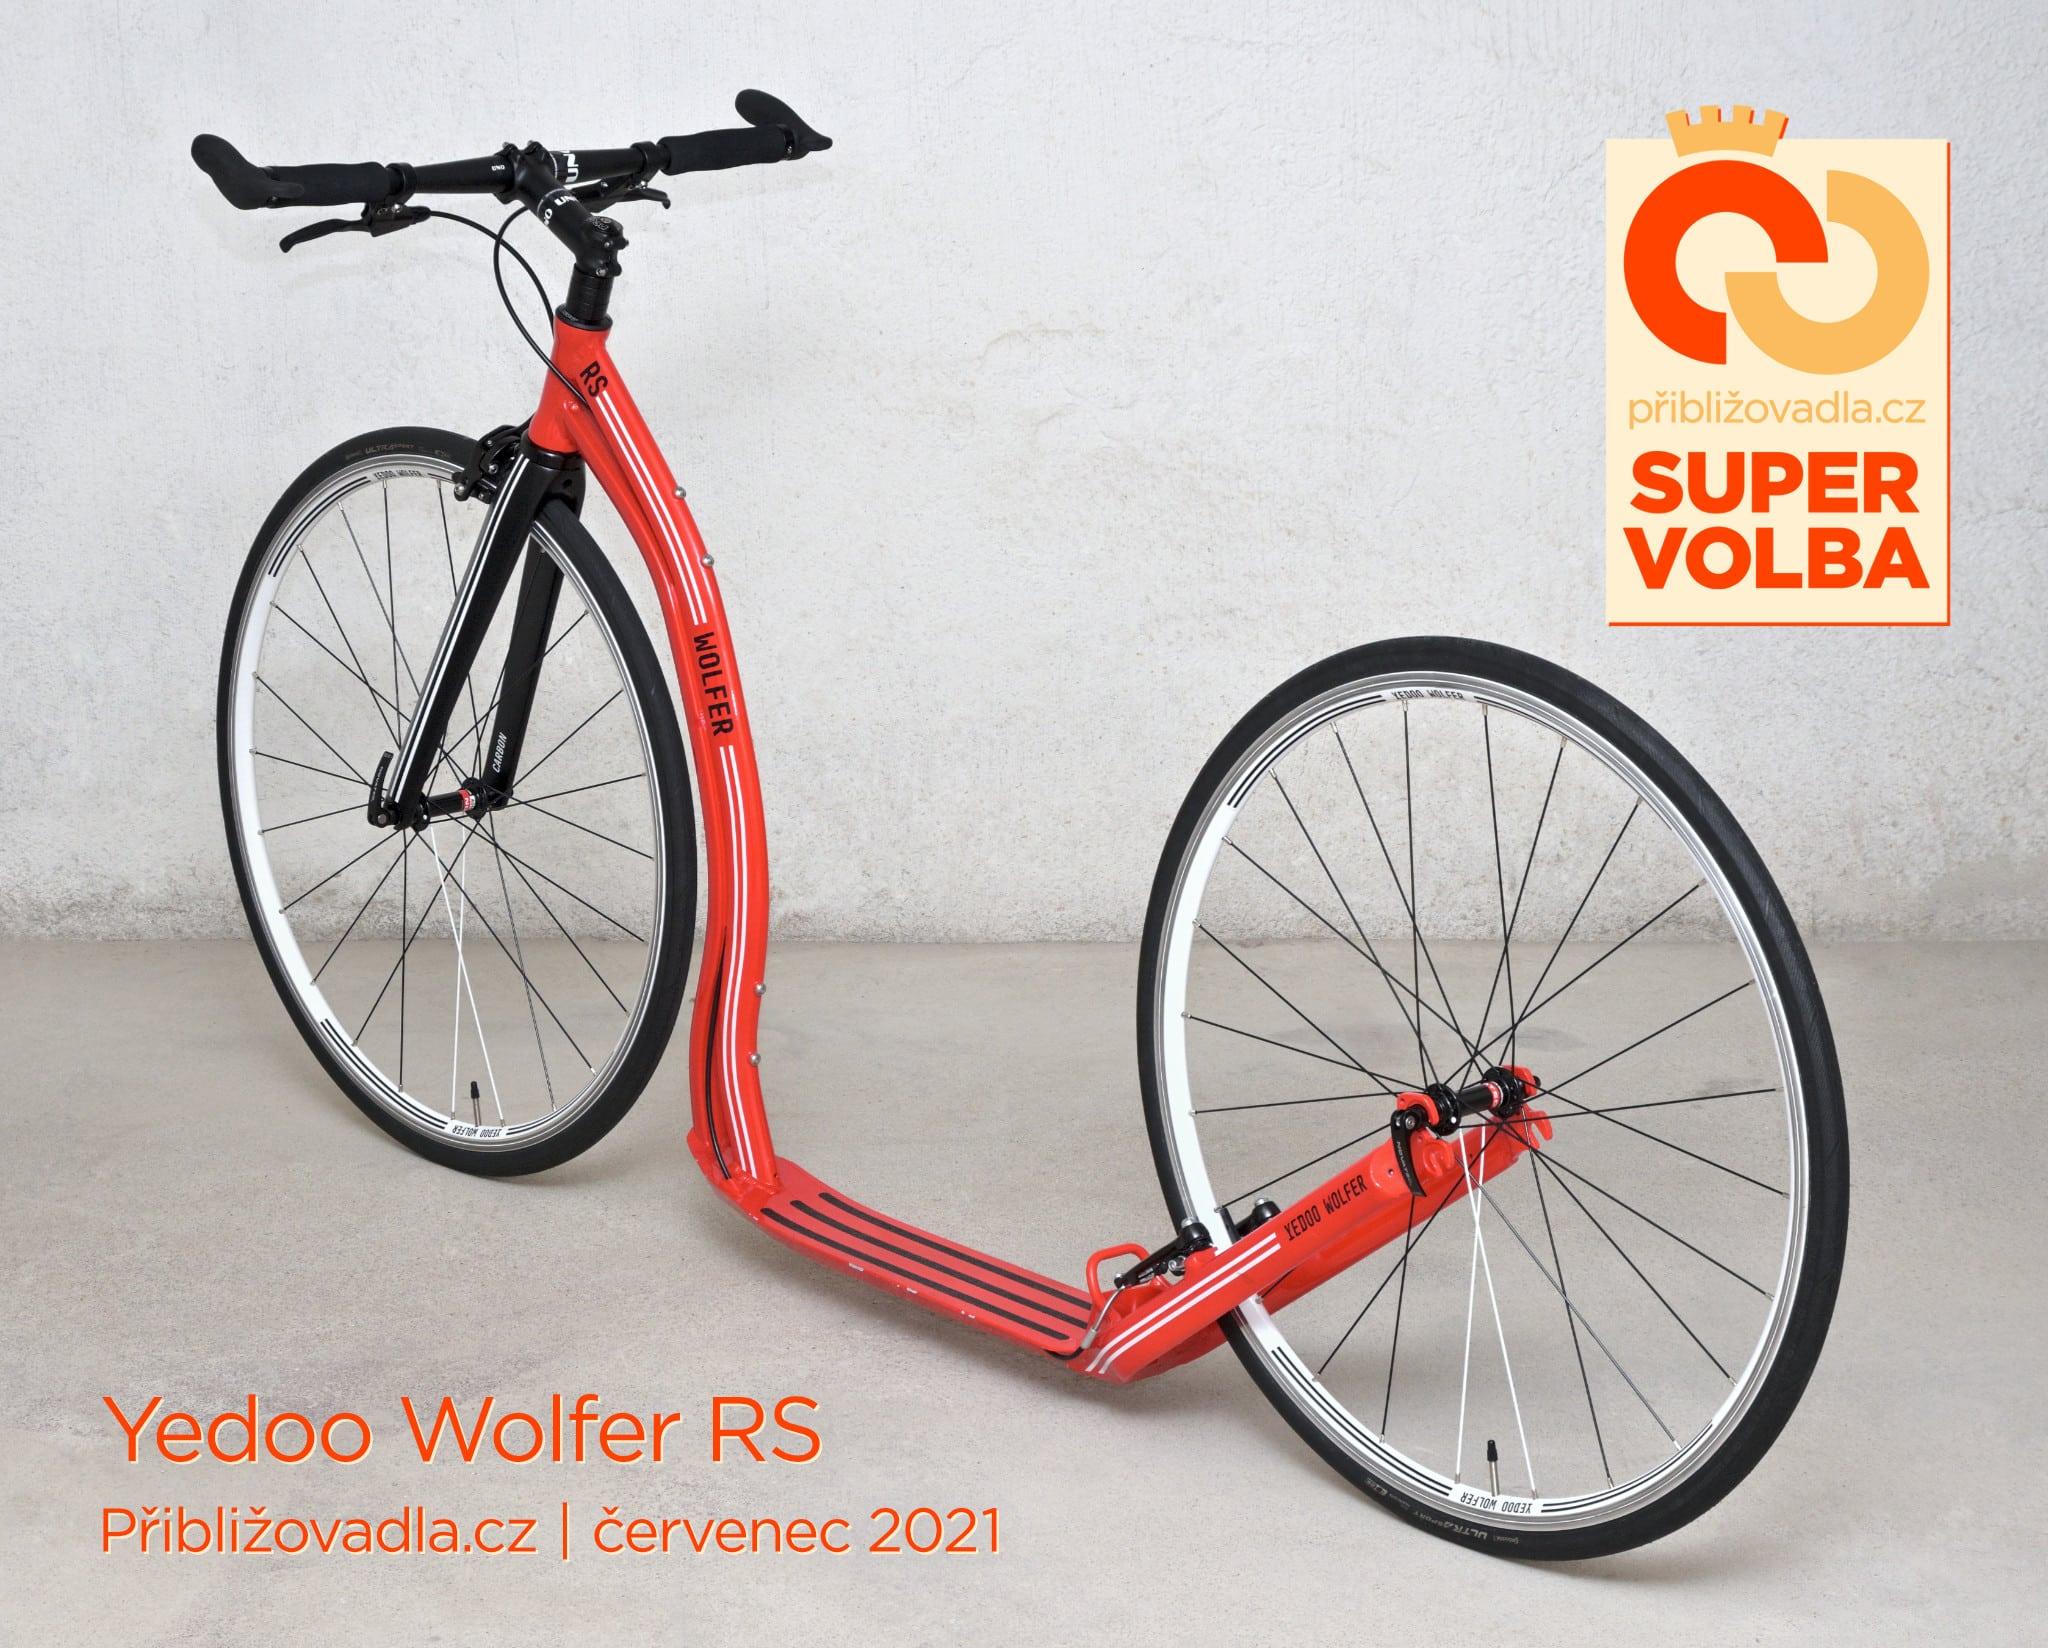 Yedoo Wolfer RS –Super volba Přibližovadel.cz